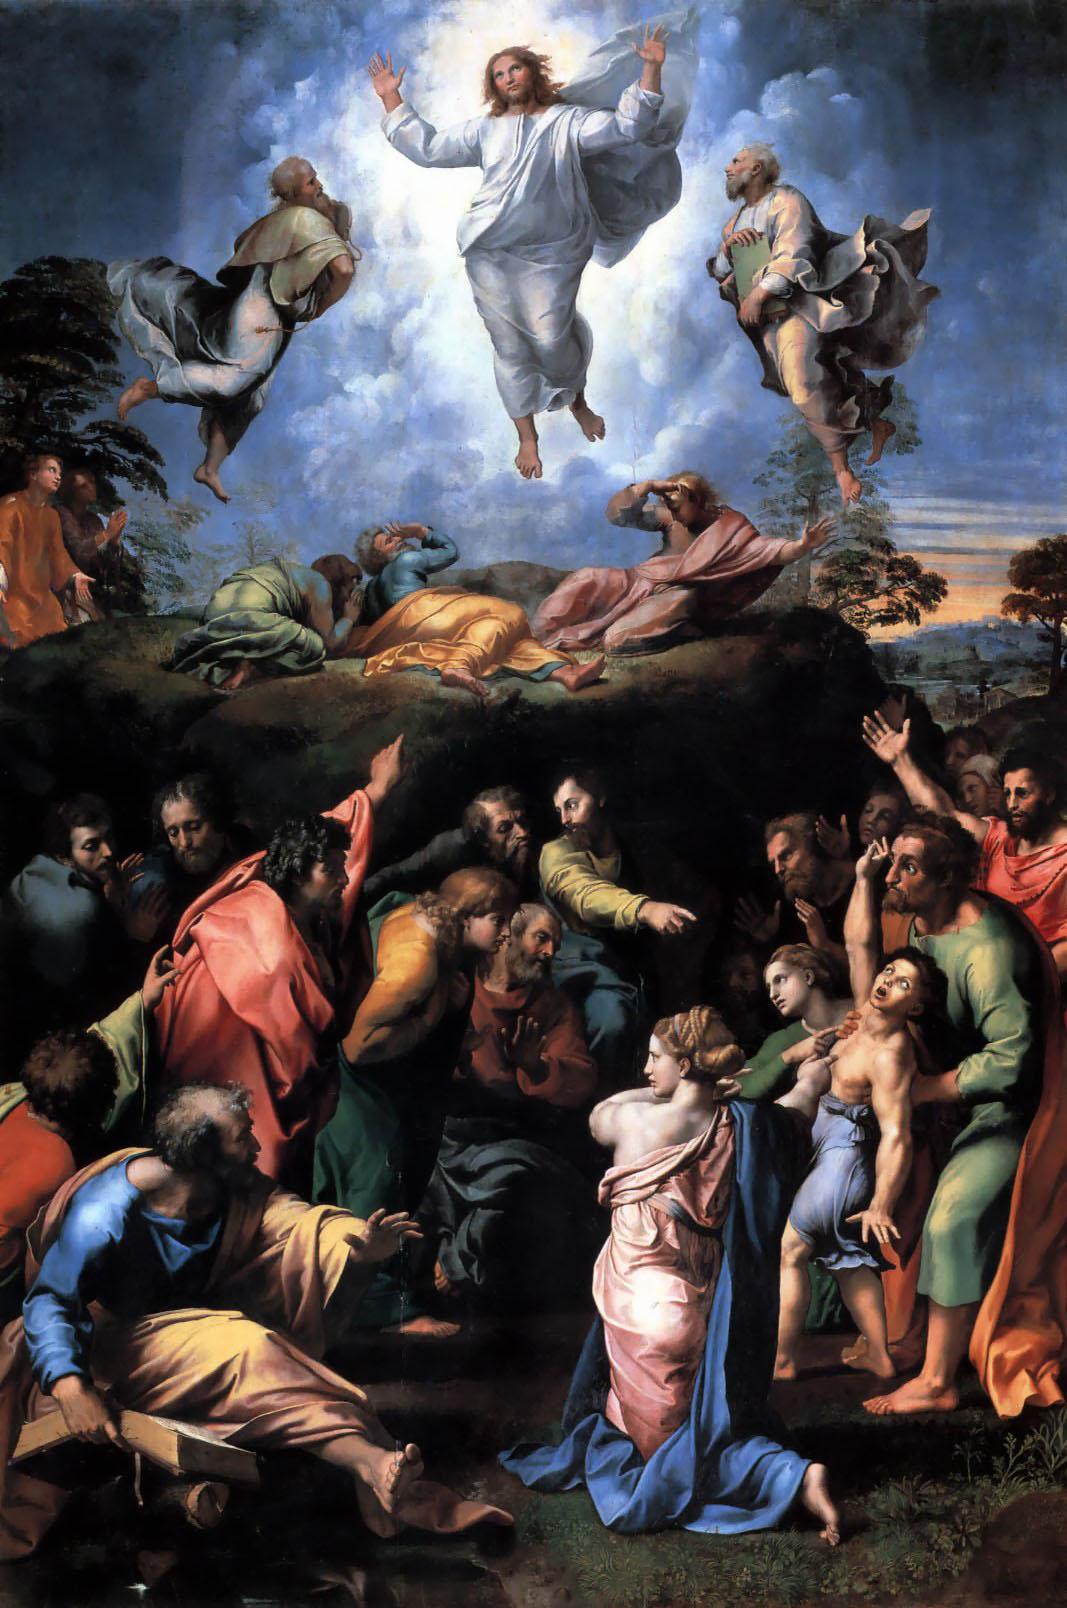 Transfiguration Dieu indivisible apparition dignité Raphaël